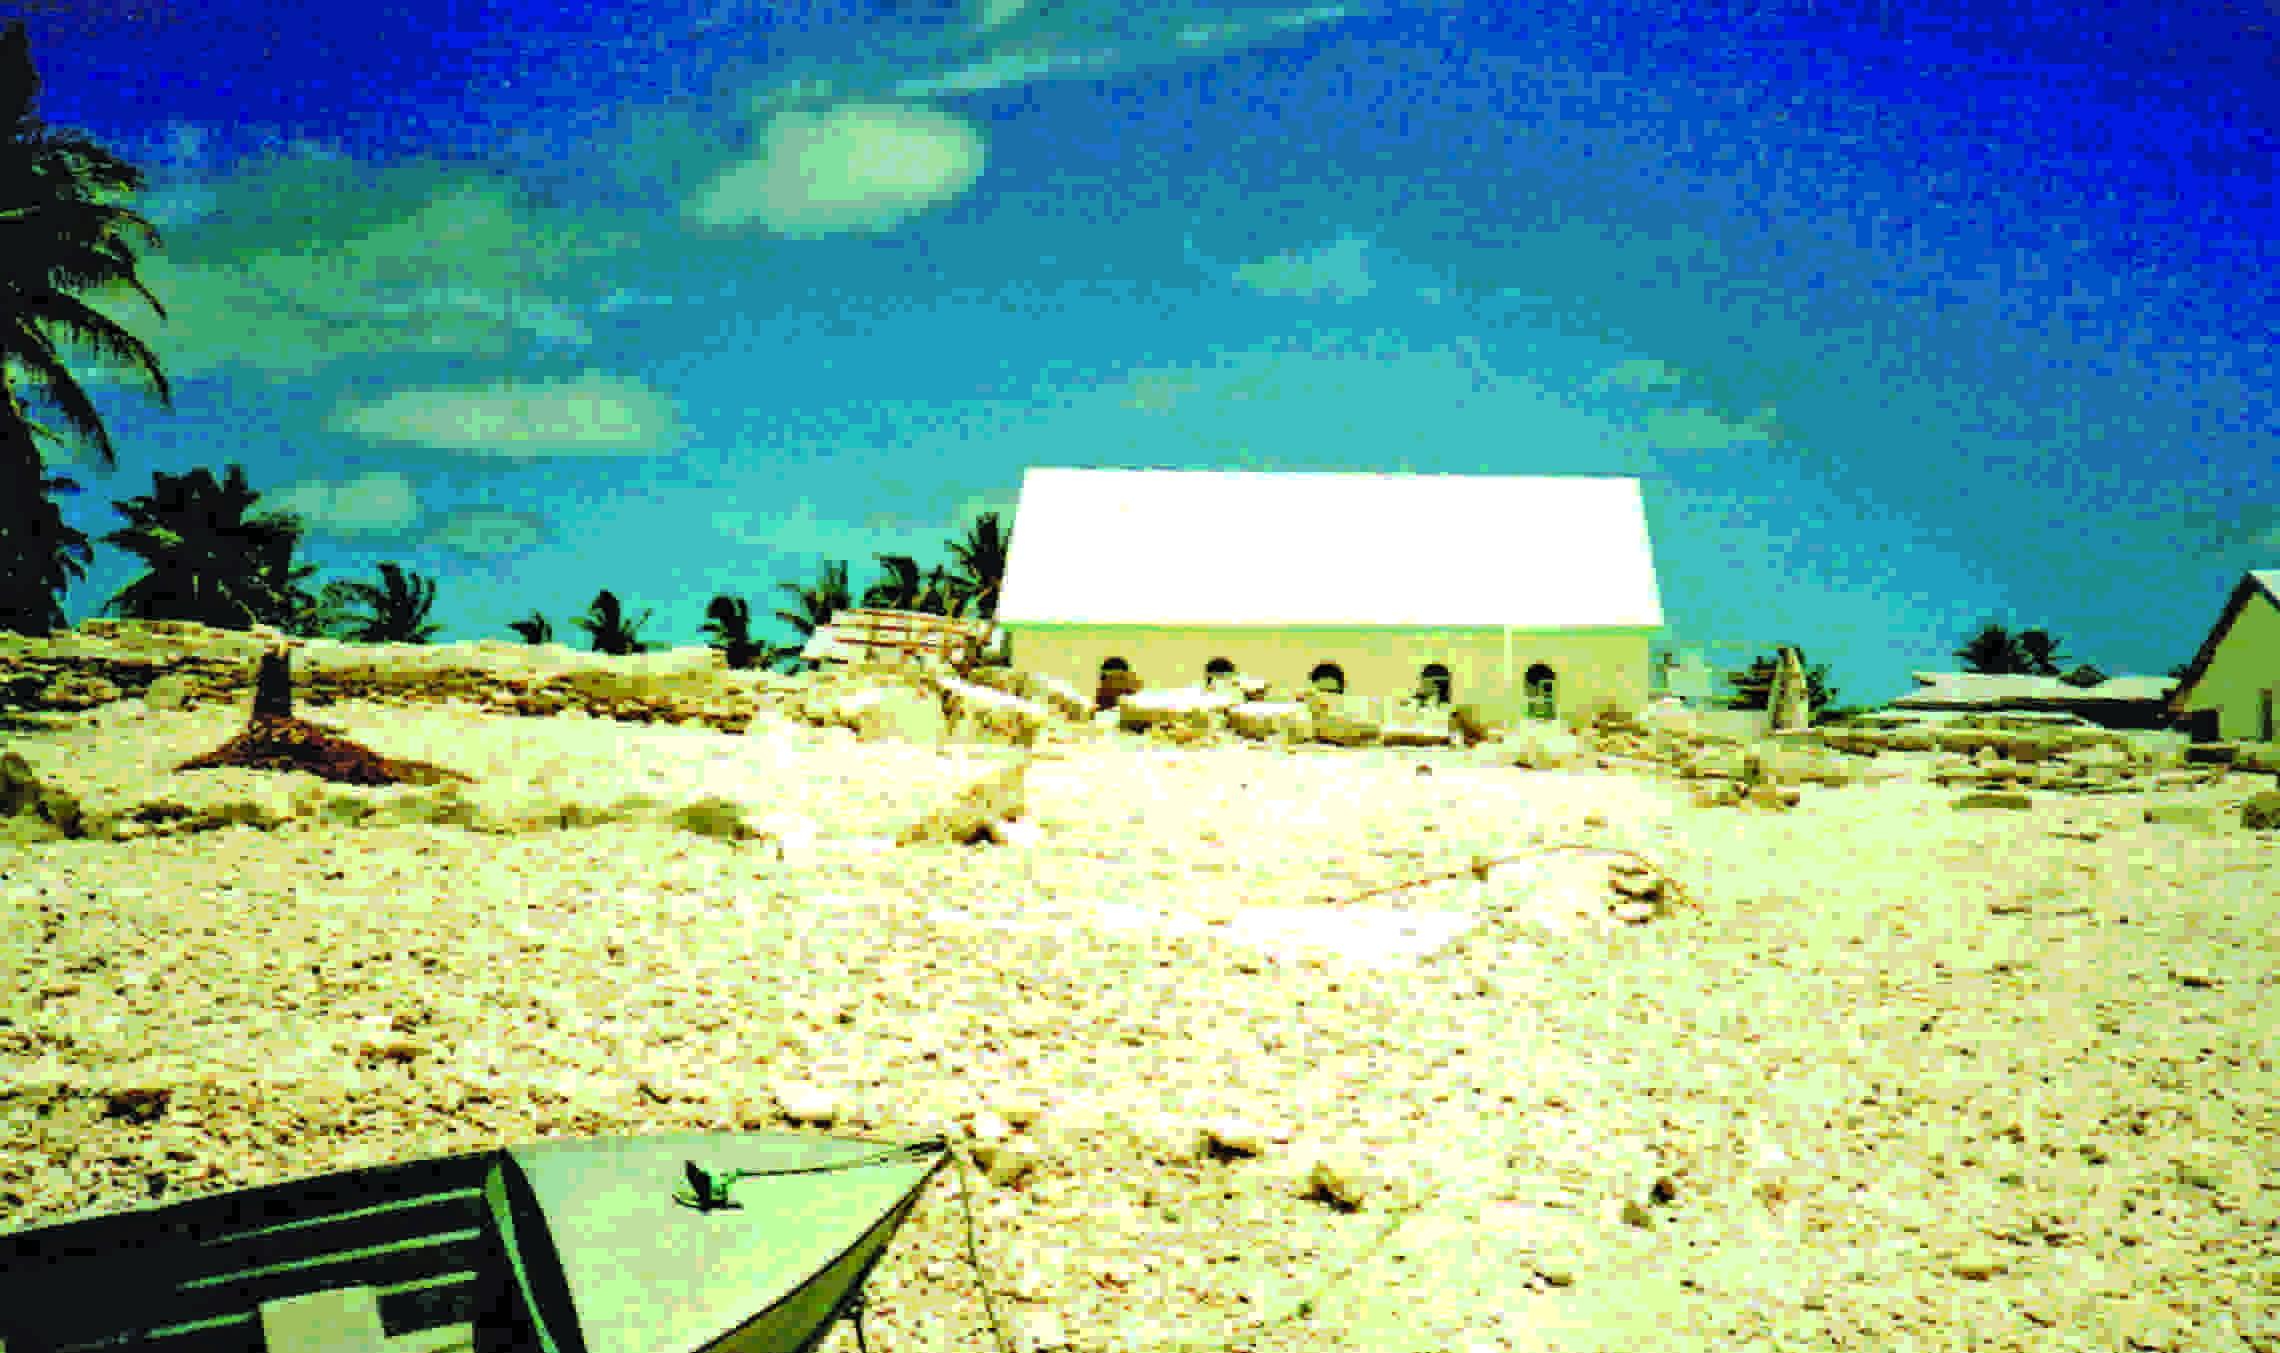 church standing